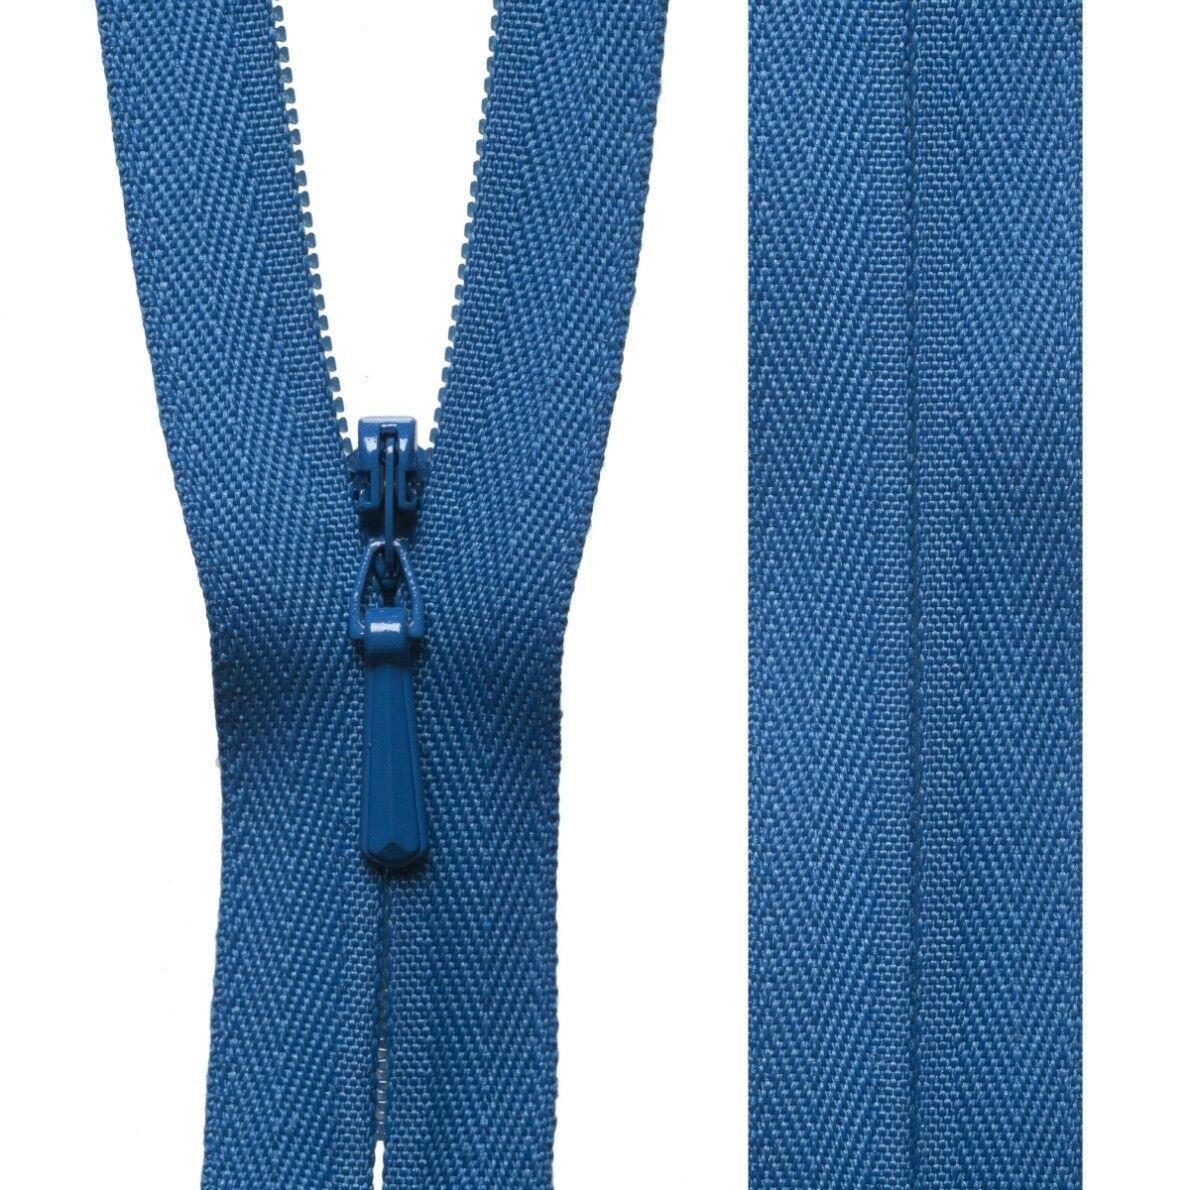 White YKK Concealed Zip Invisible Zip Closed End 20cm23cm41cm56cm